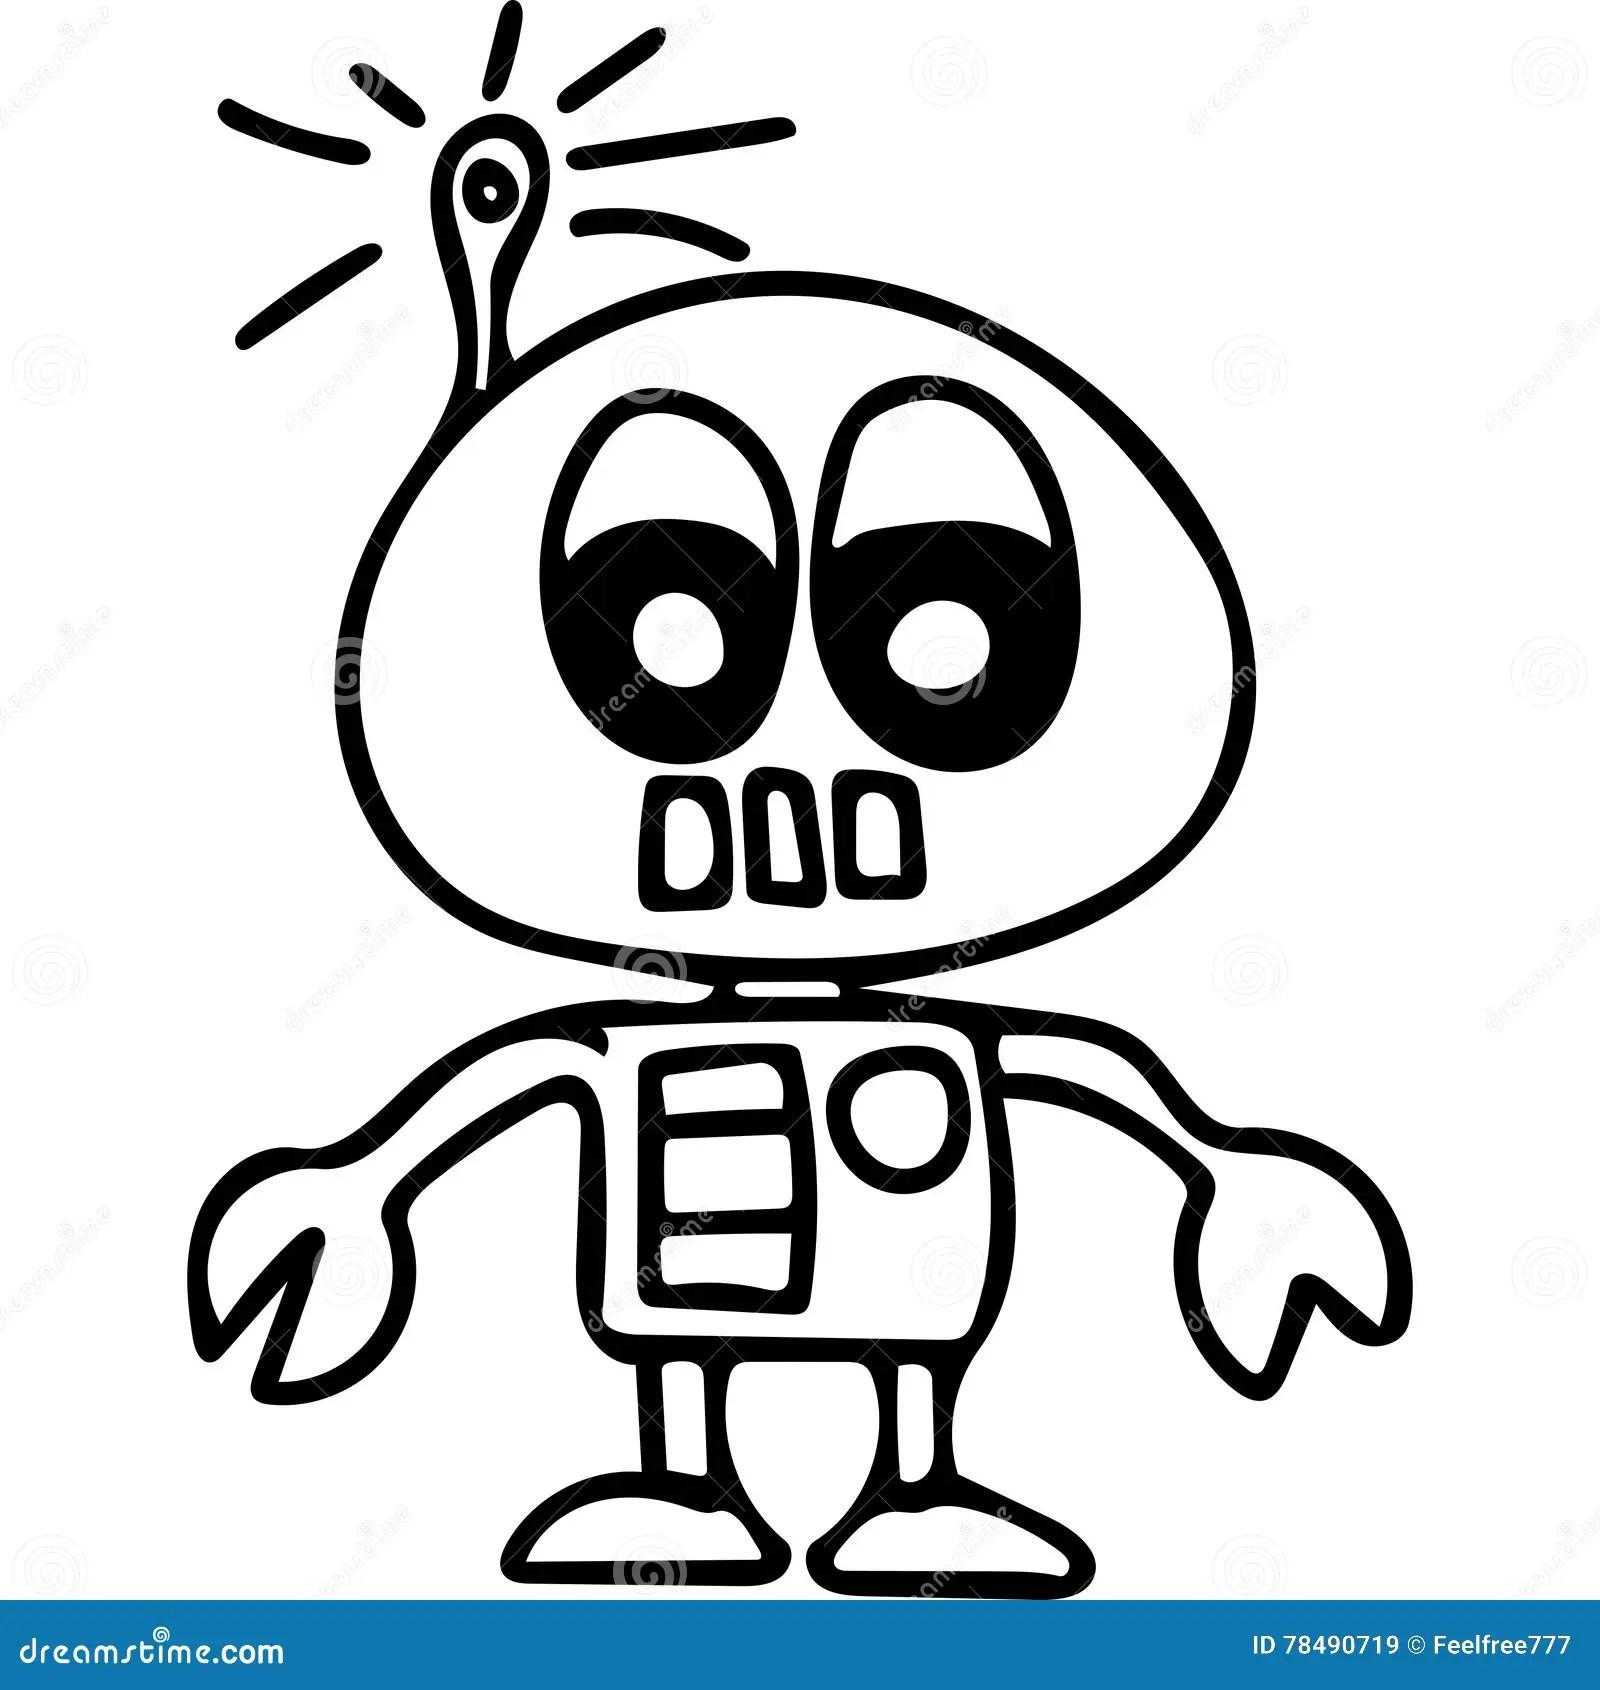 Robot kids coloring page stock illustration. Illustration